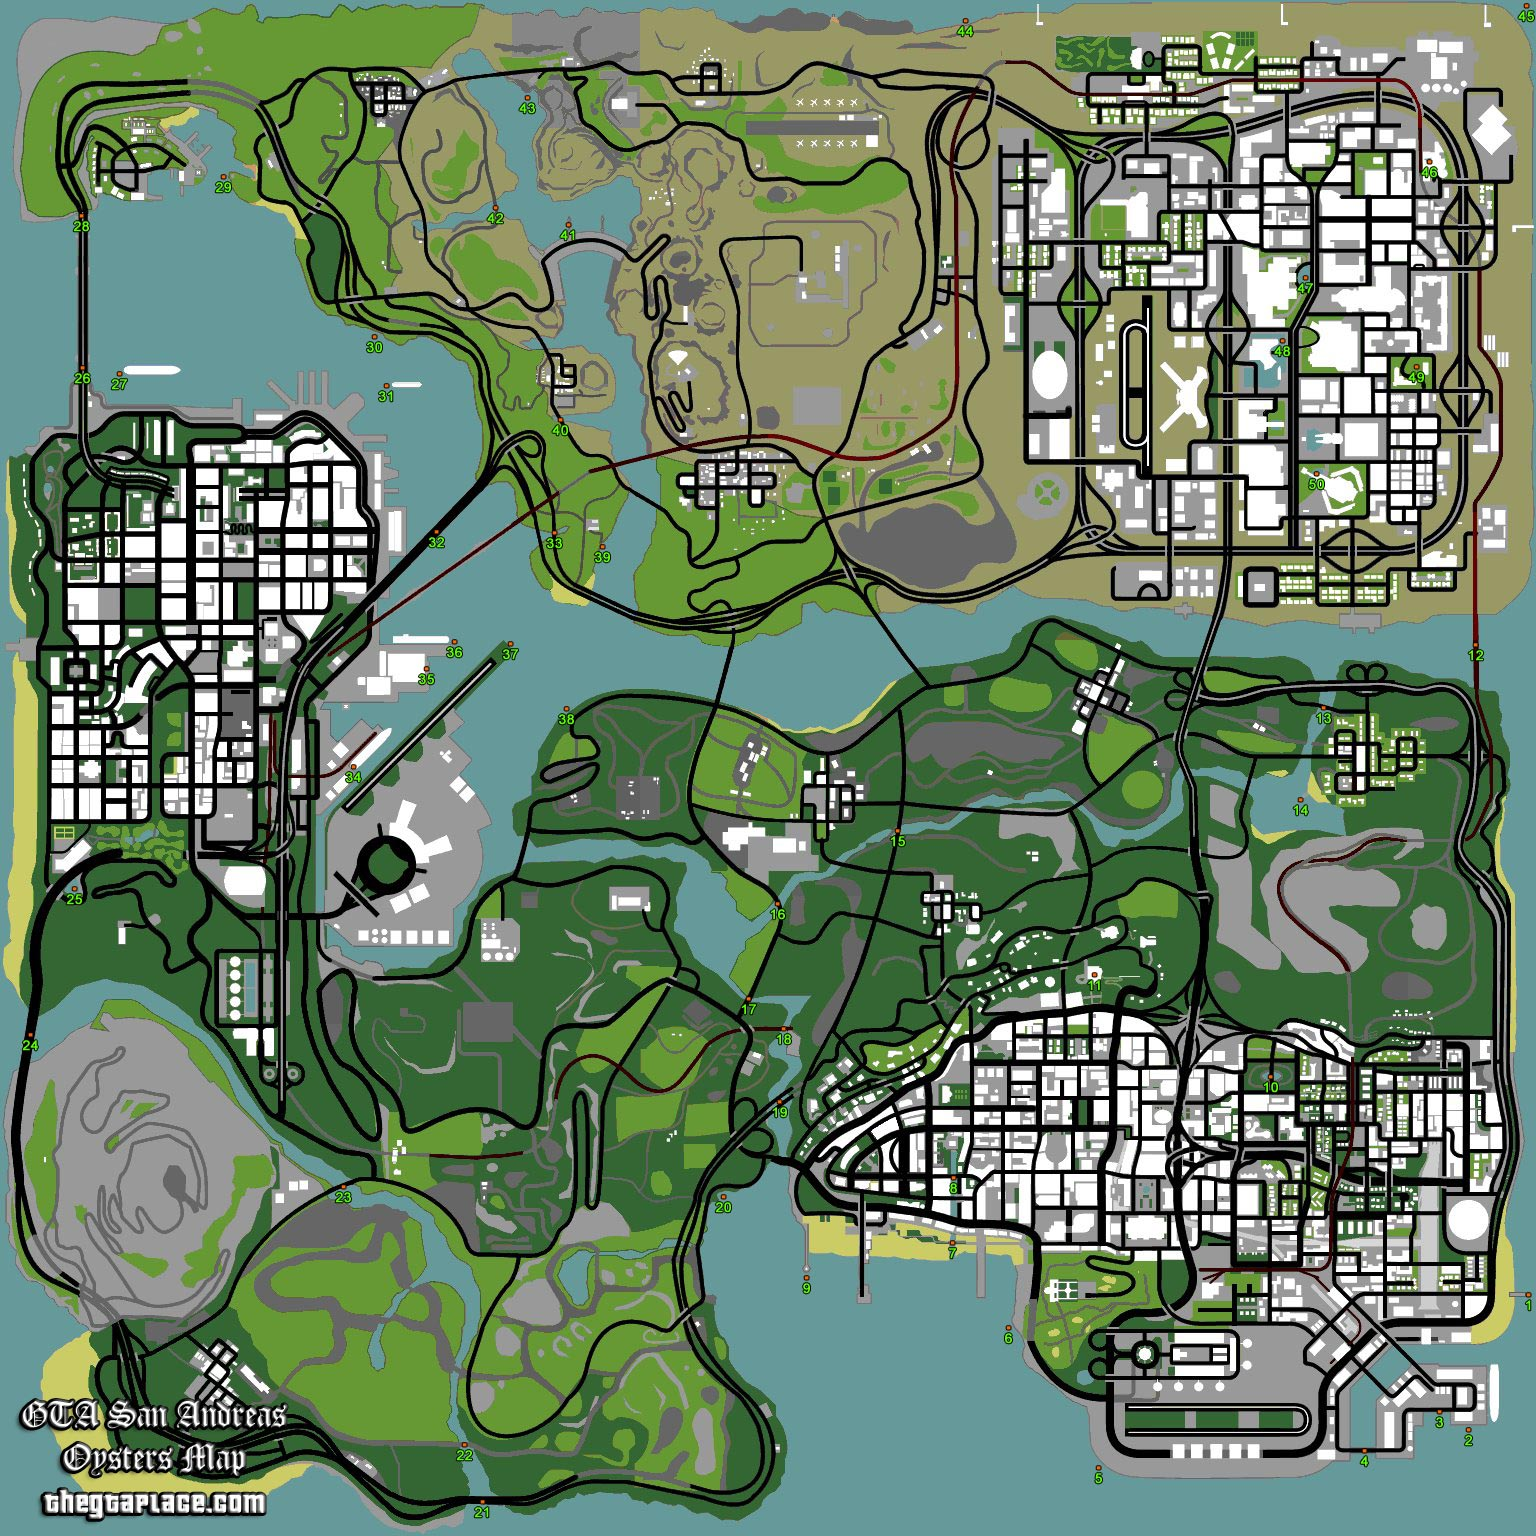 GTA San Andreas hidden package location maps  Gallery  eBaums World